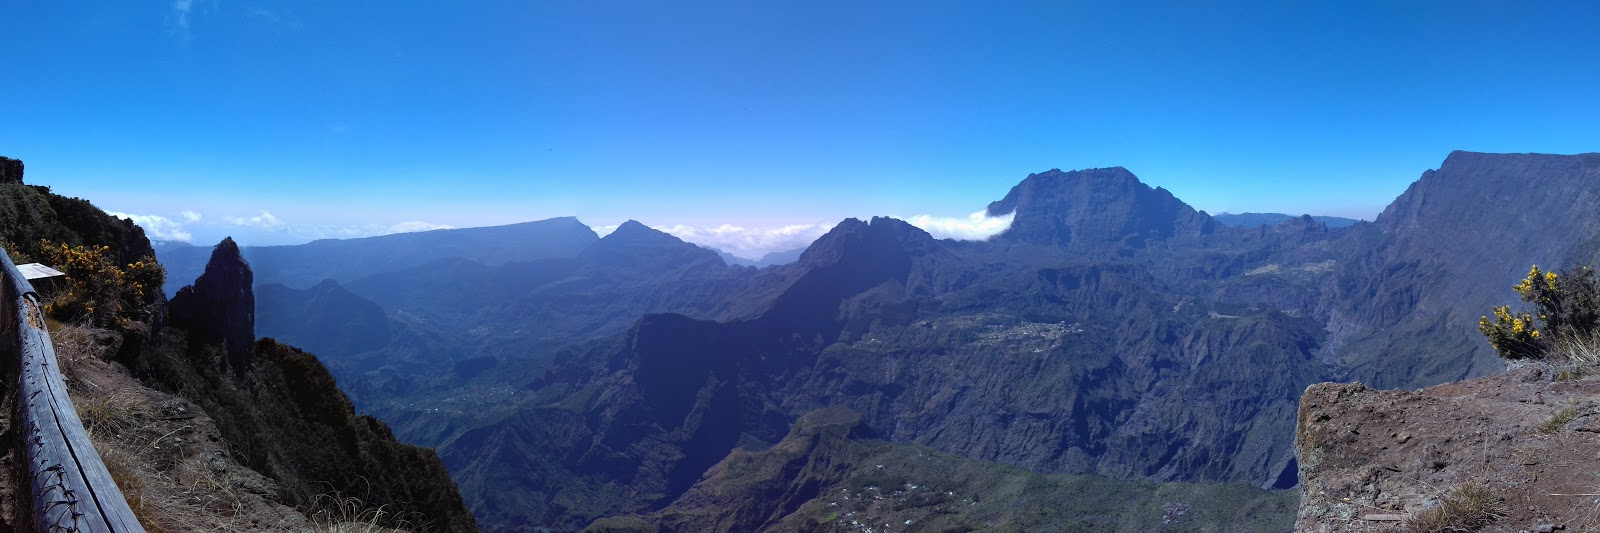 Free photo: Pito Maido, Reunion Island, Volcano - Free Image on ...